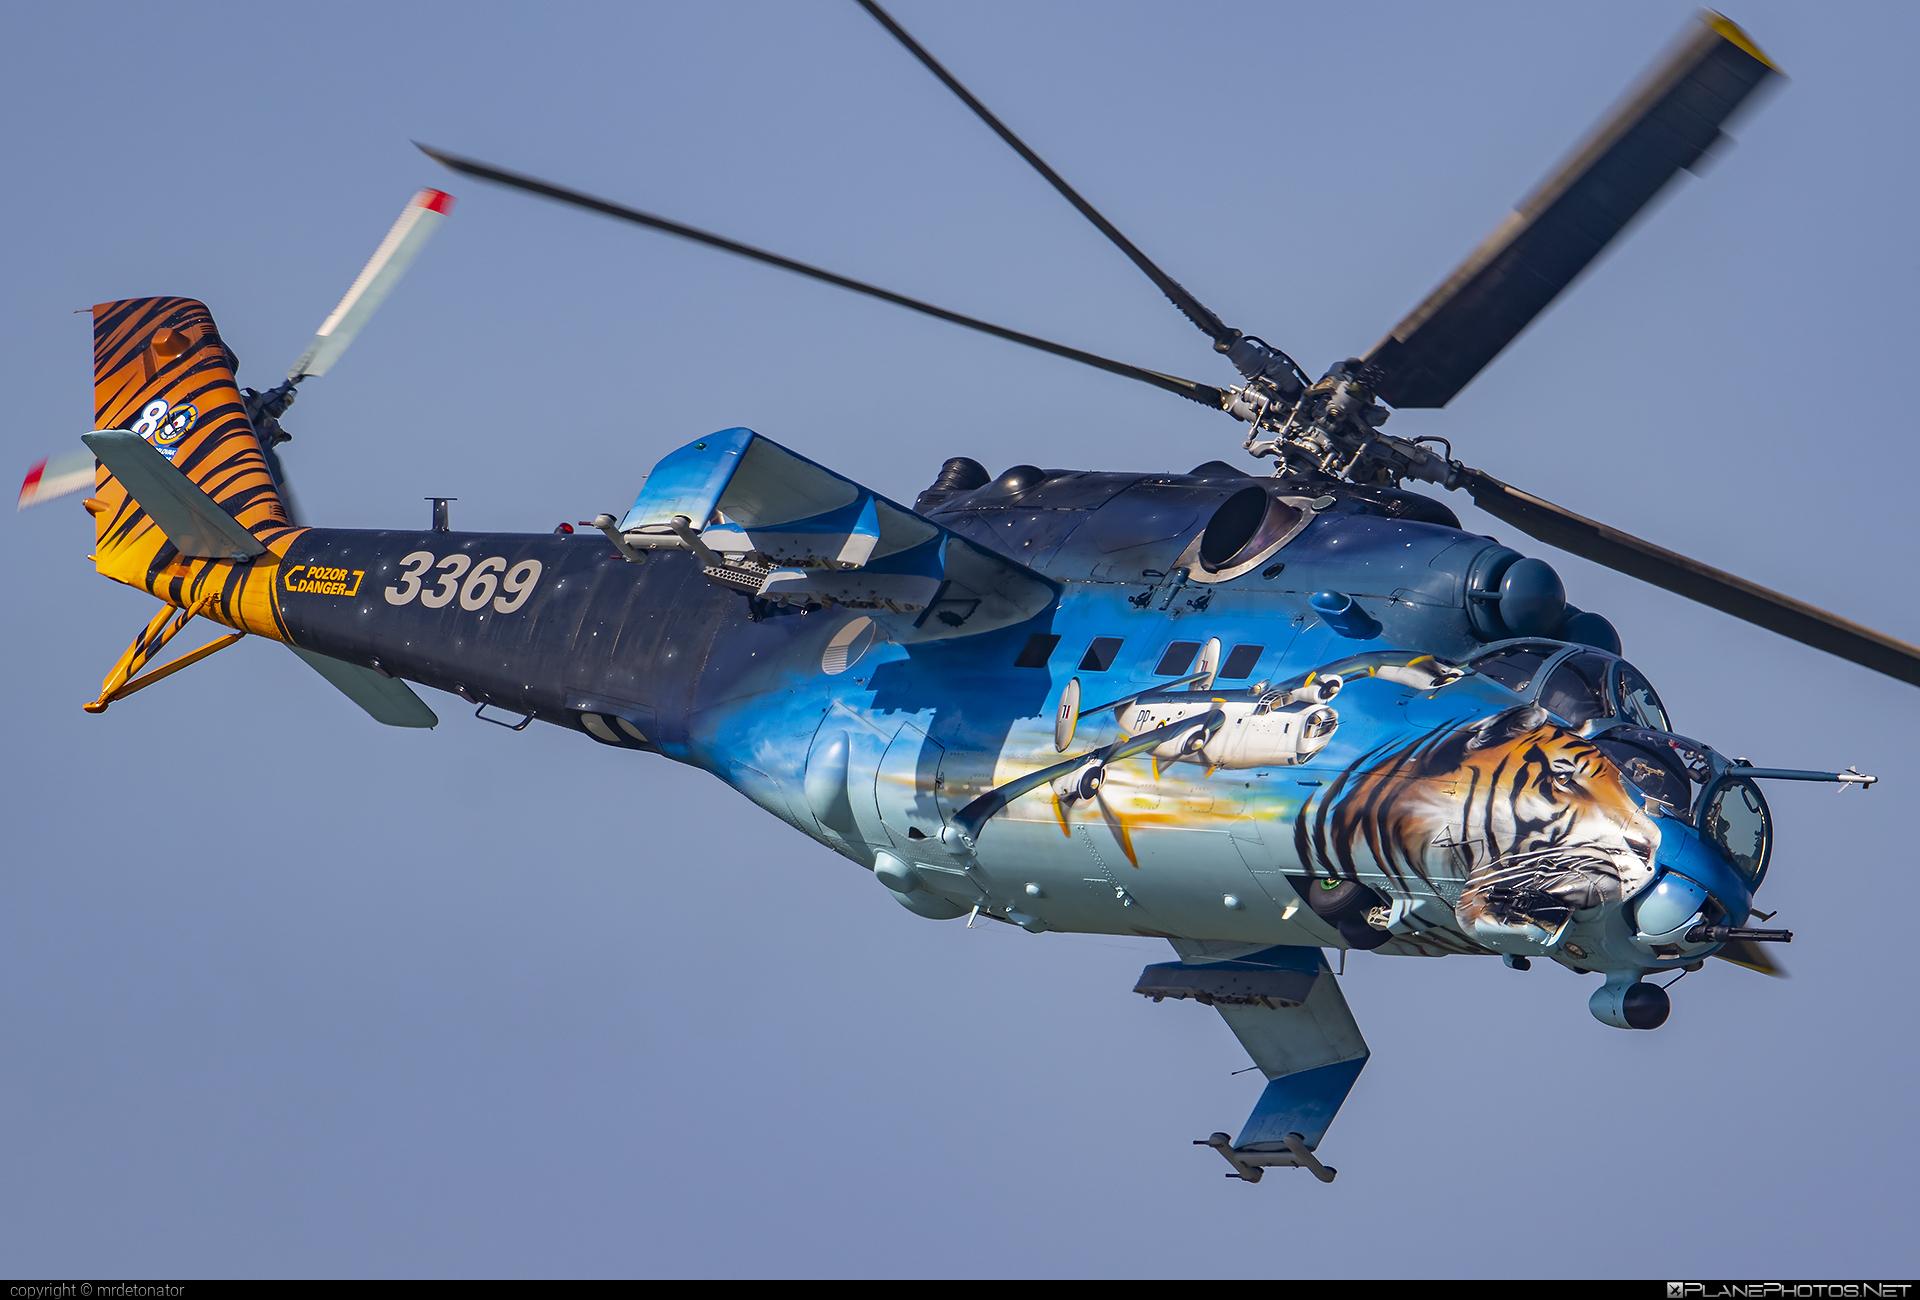 Mil Mi-35 - 3369 operated by Vzdušné síly AČR (Czech Air Force) #czechairforce #mi35 #mil #milhelicopters #siaf2021 #vzdusnesilyacr